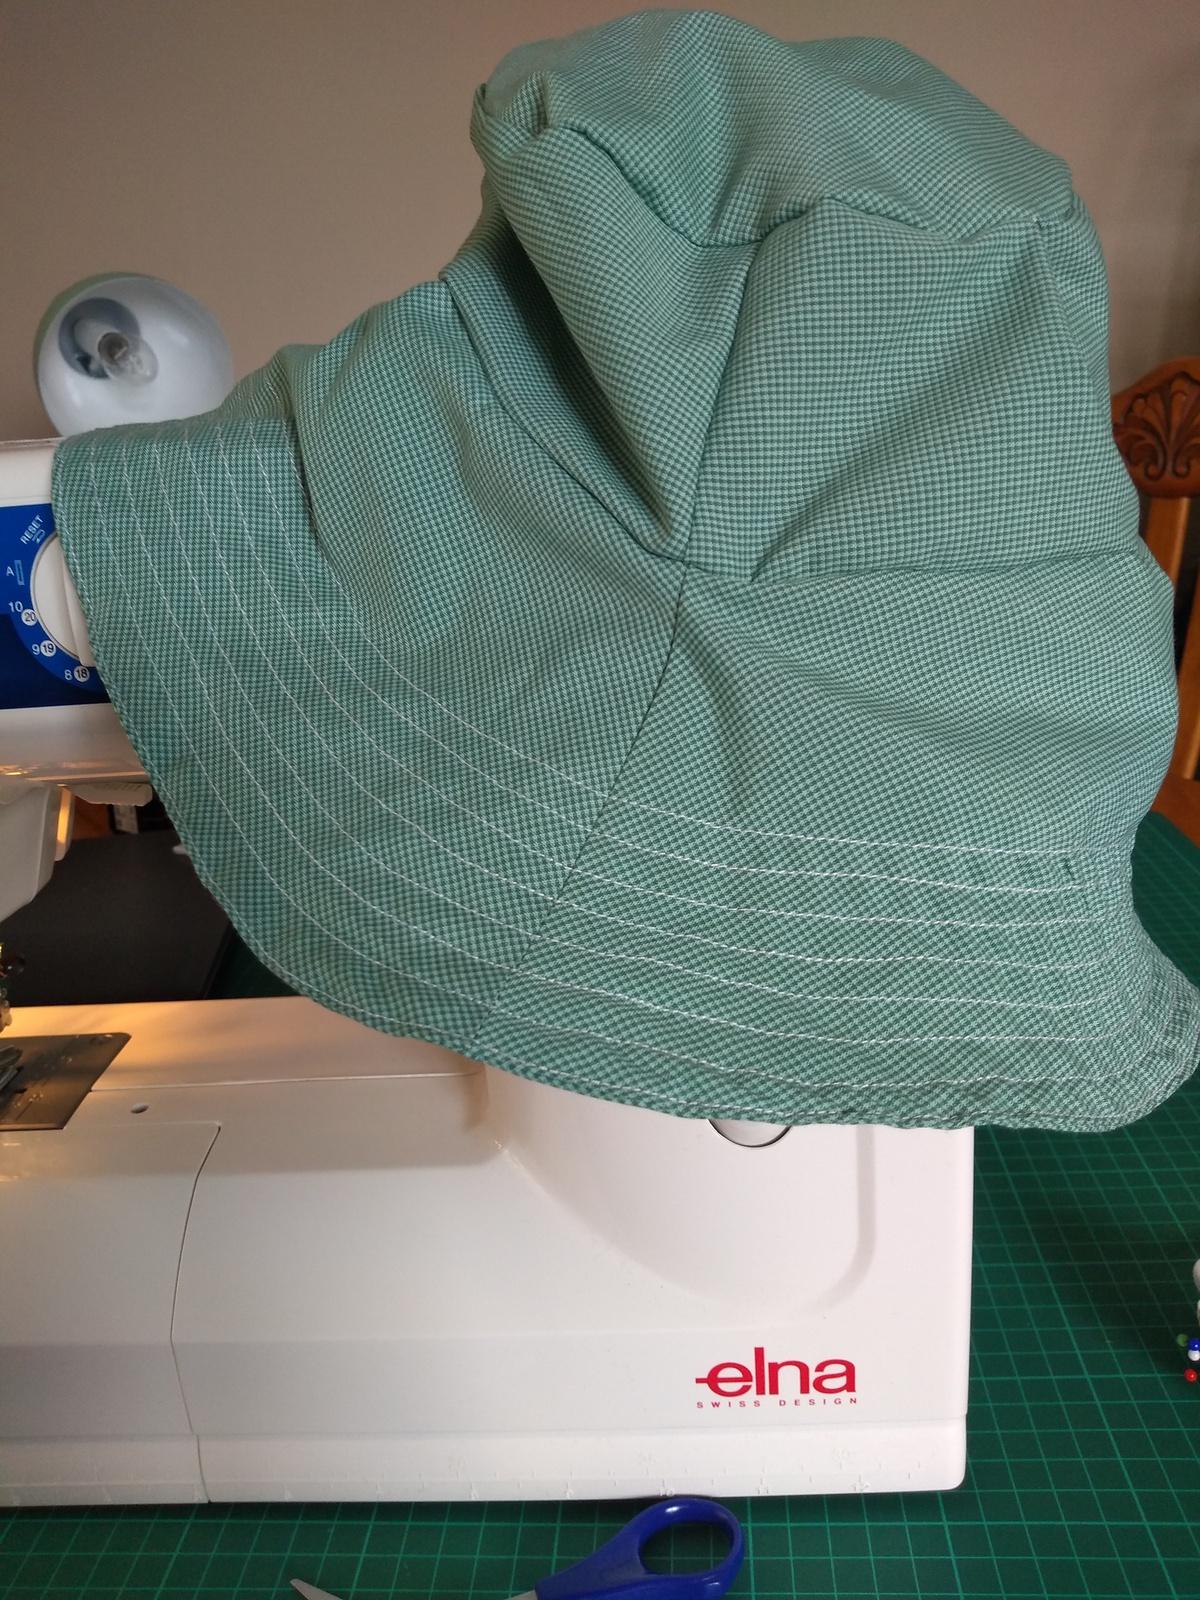 Free Bucket Hat sewing pattern Rosery Apparel